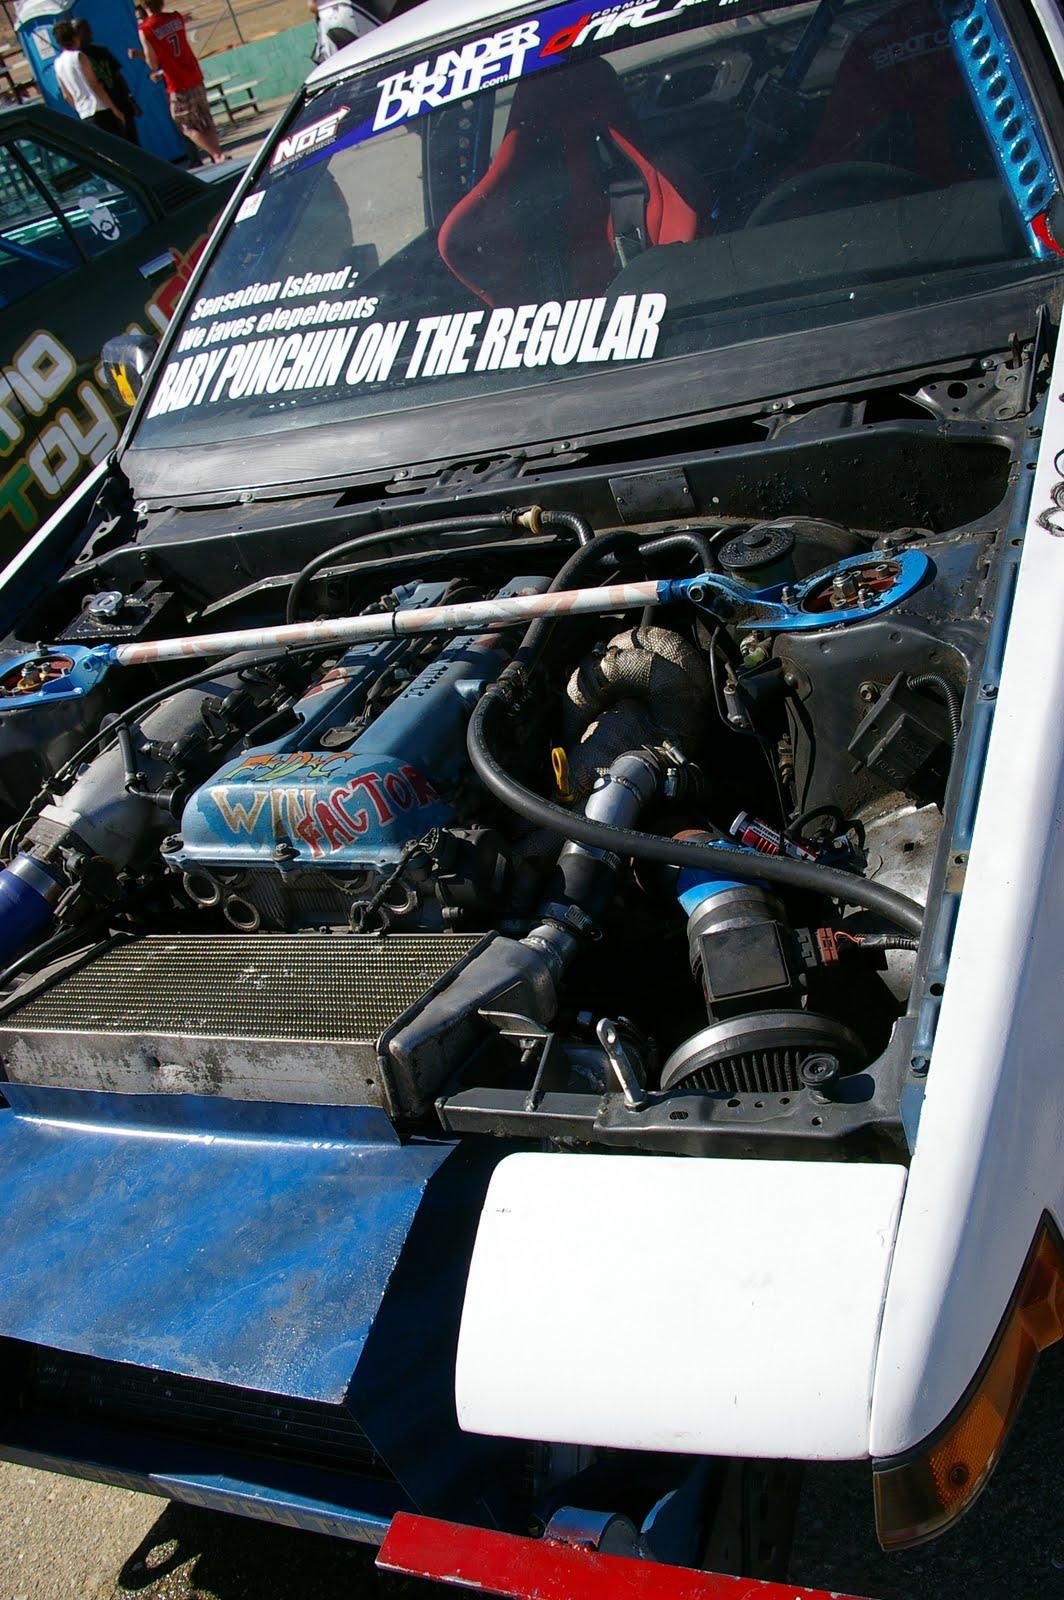 Alfa Img Showing Gt 2010 Chevy Impala Ss Horsepower